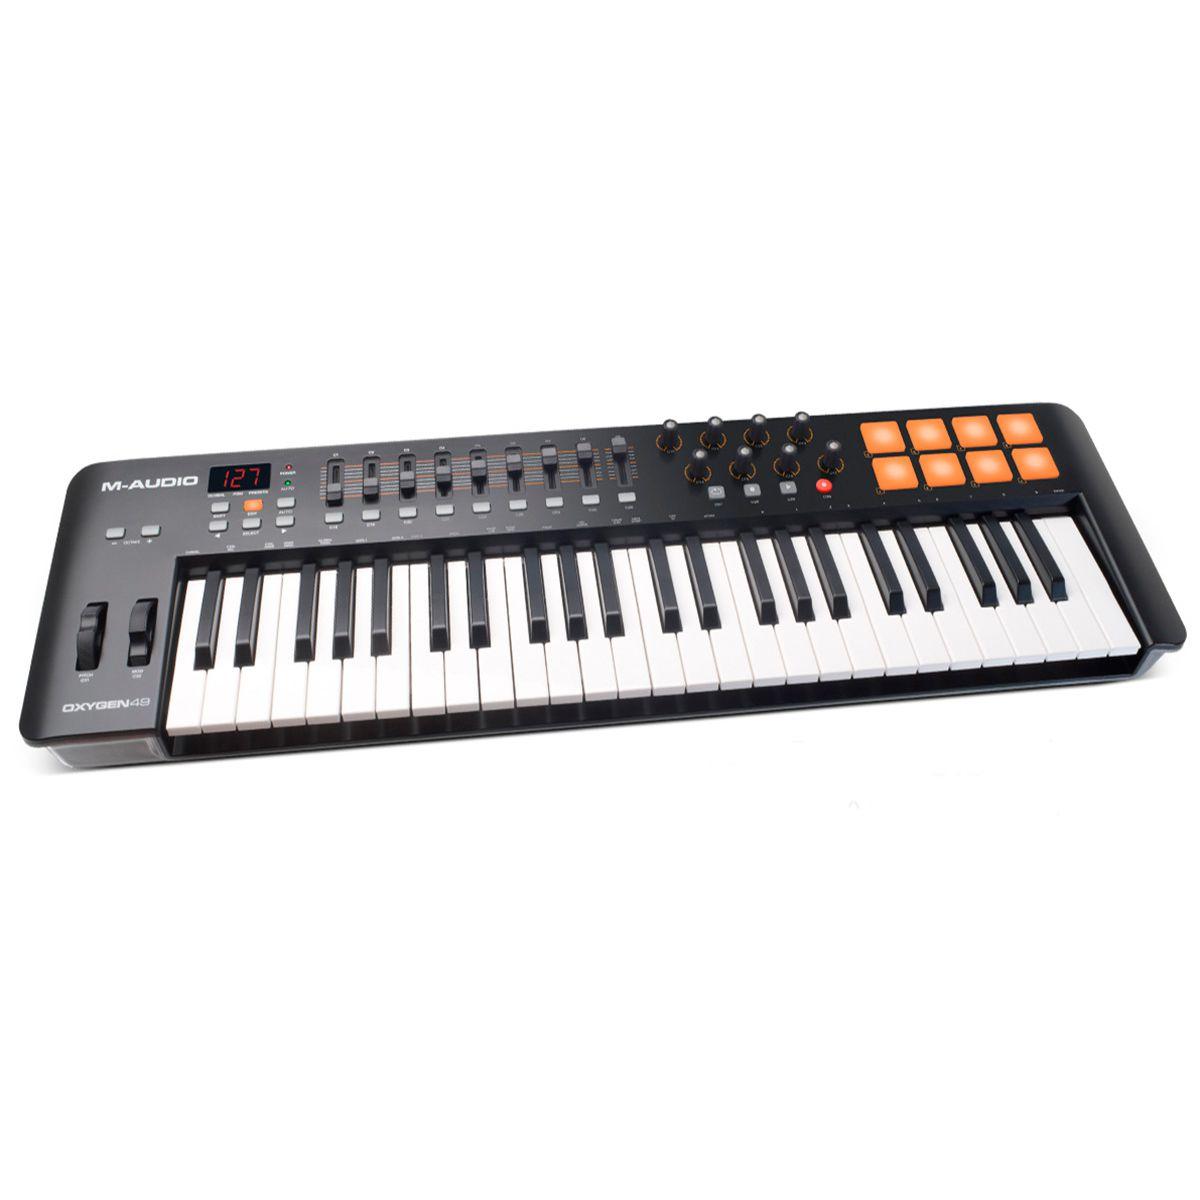 Teclado Controlador M-Audio OXYGEN 49 IV